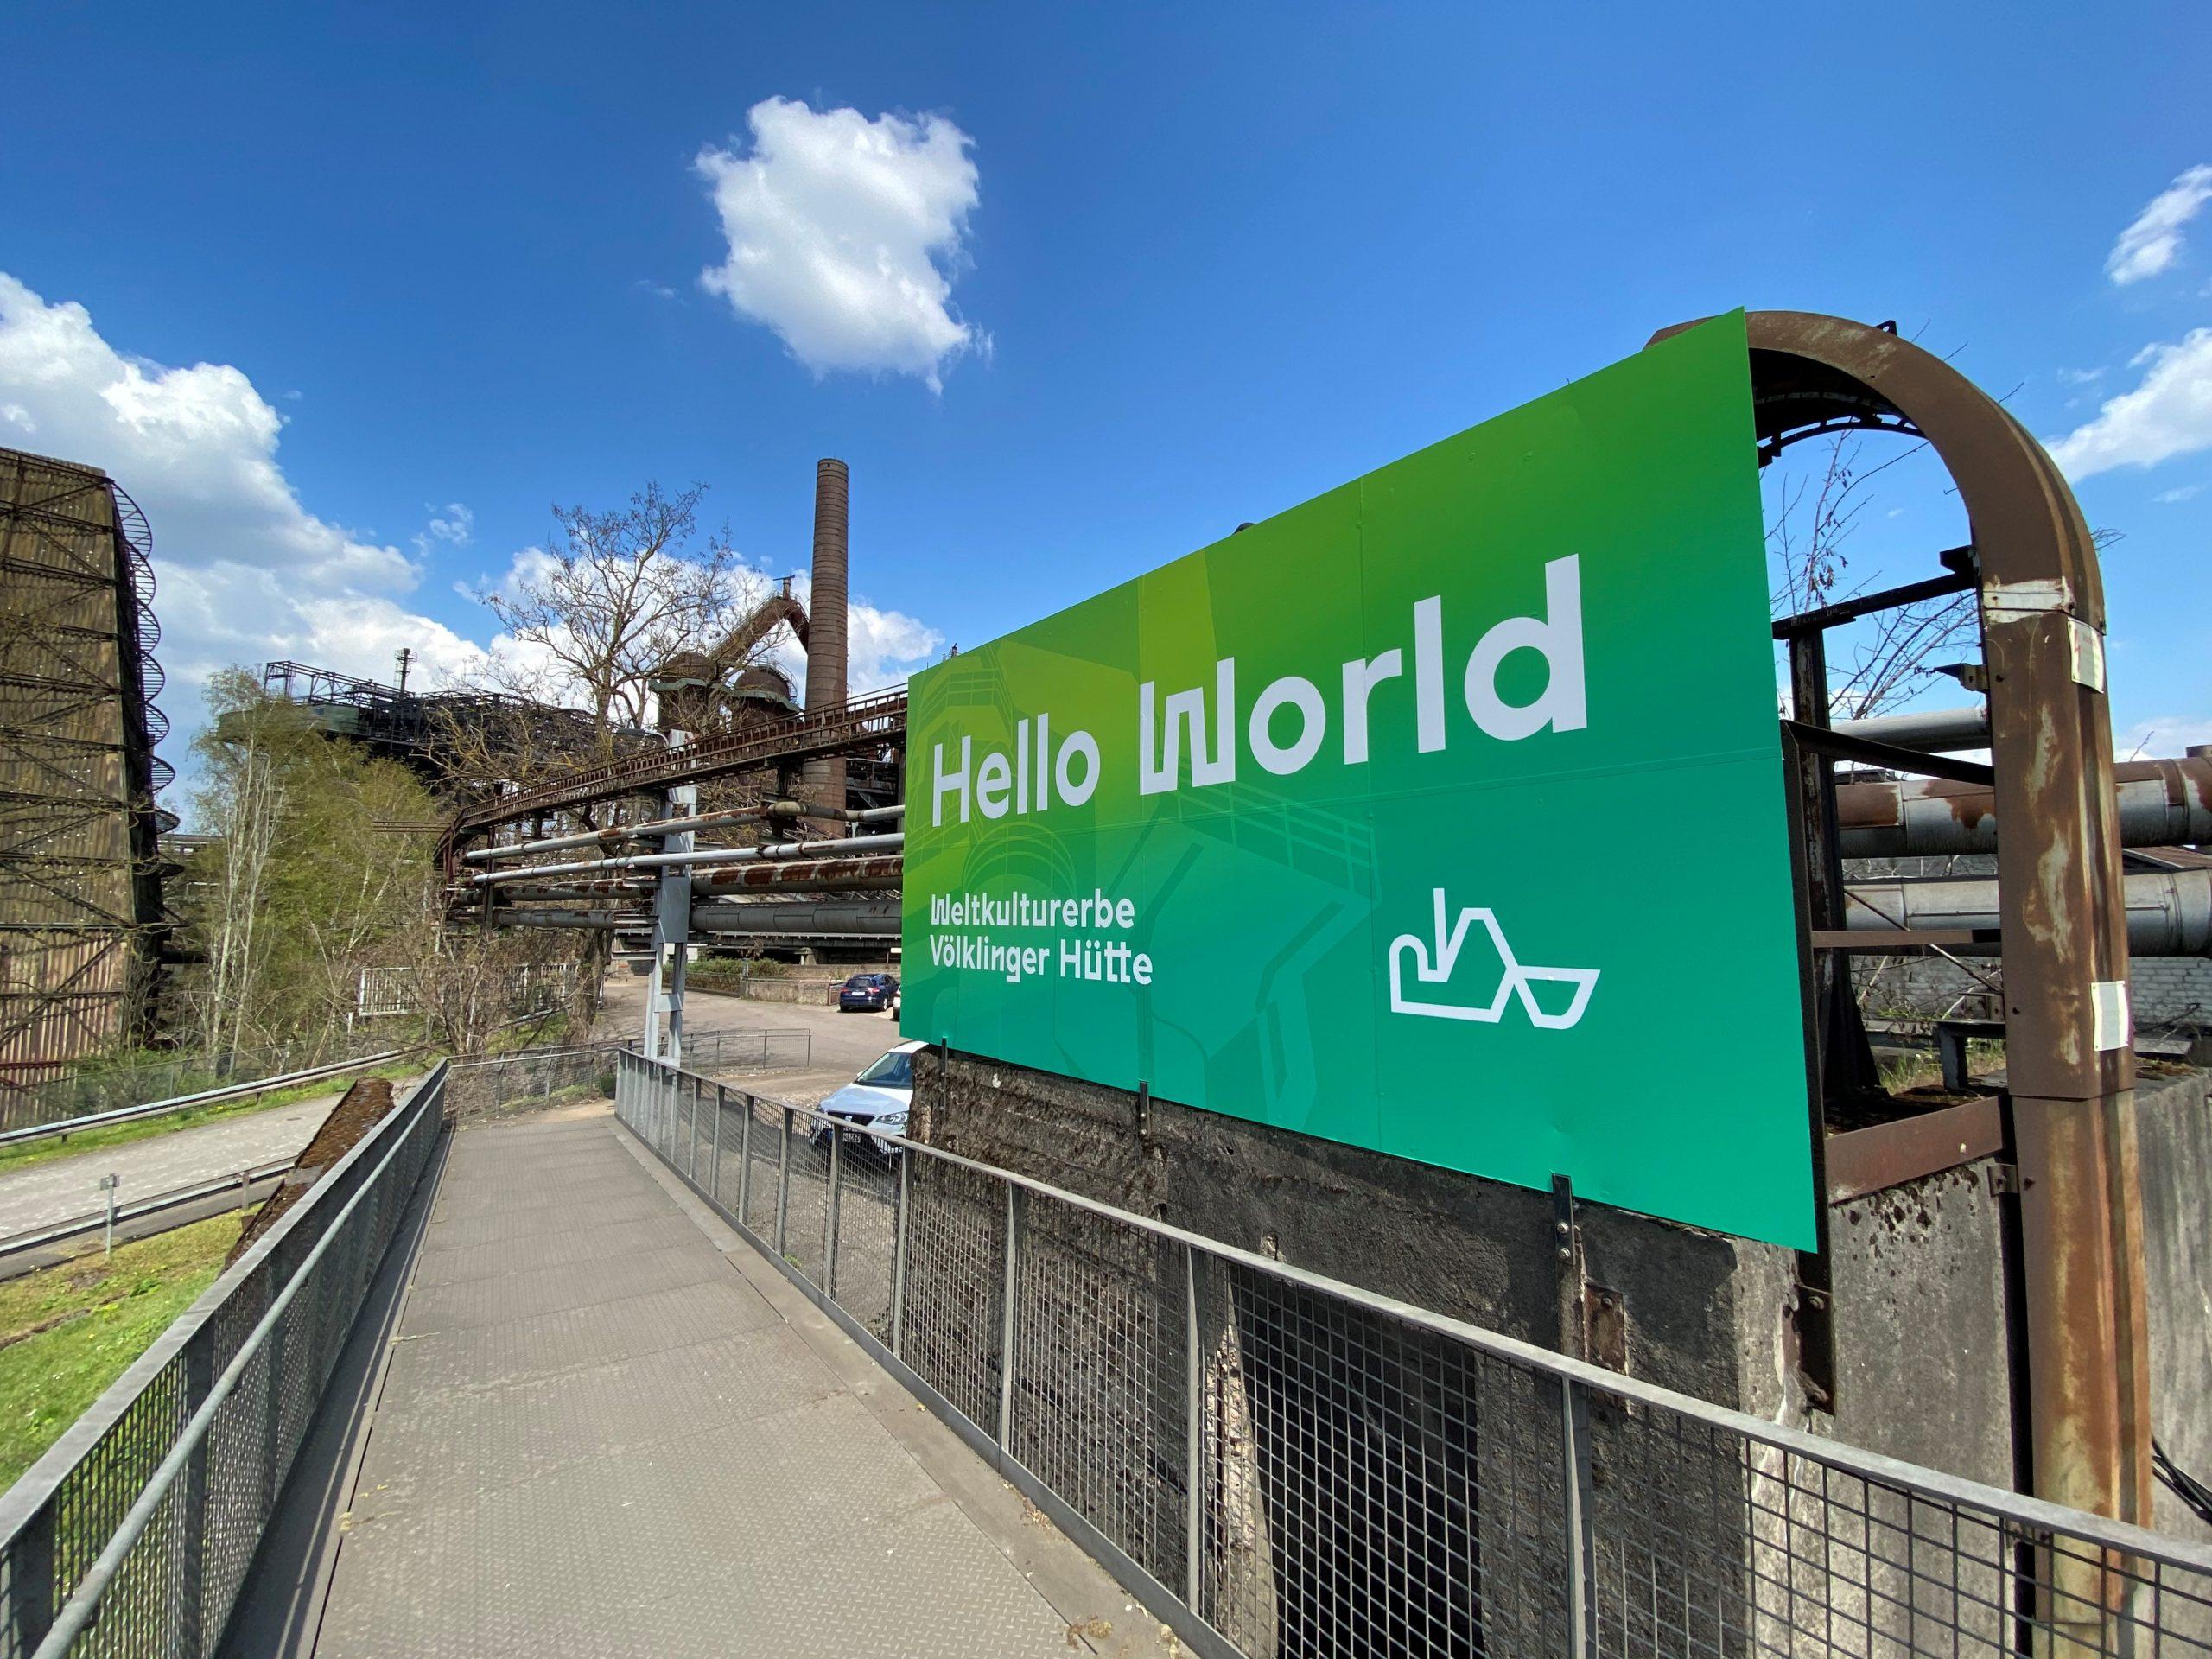 Hello World im Weltkulturerbe